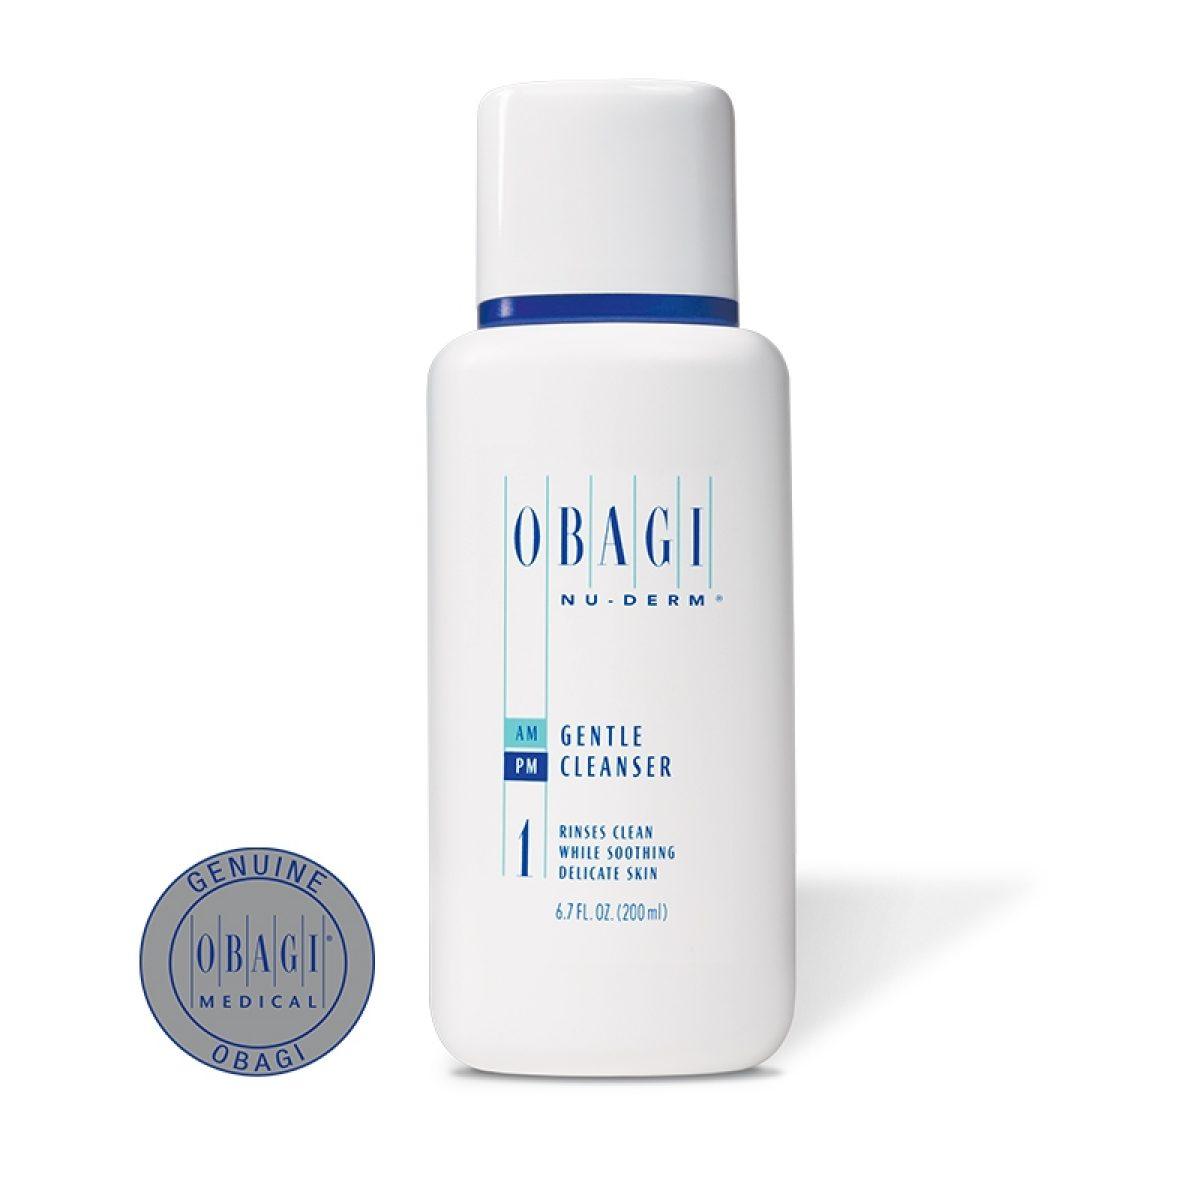 Obagi Nu-Derm® Gentle Cleanser